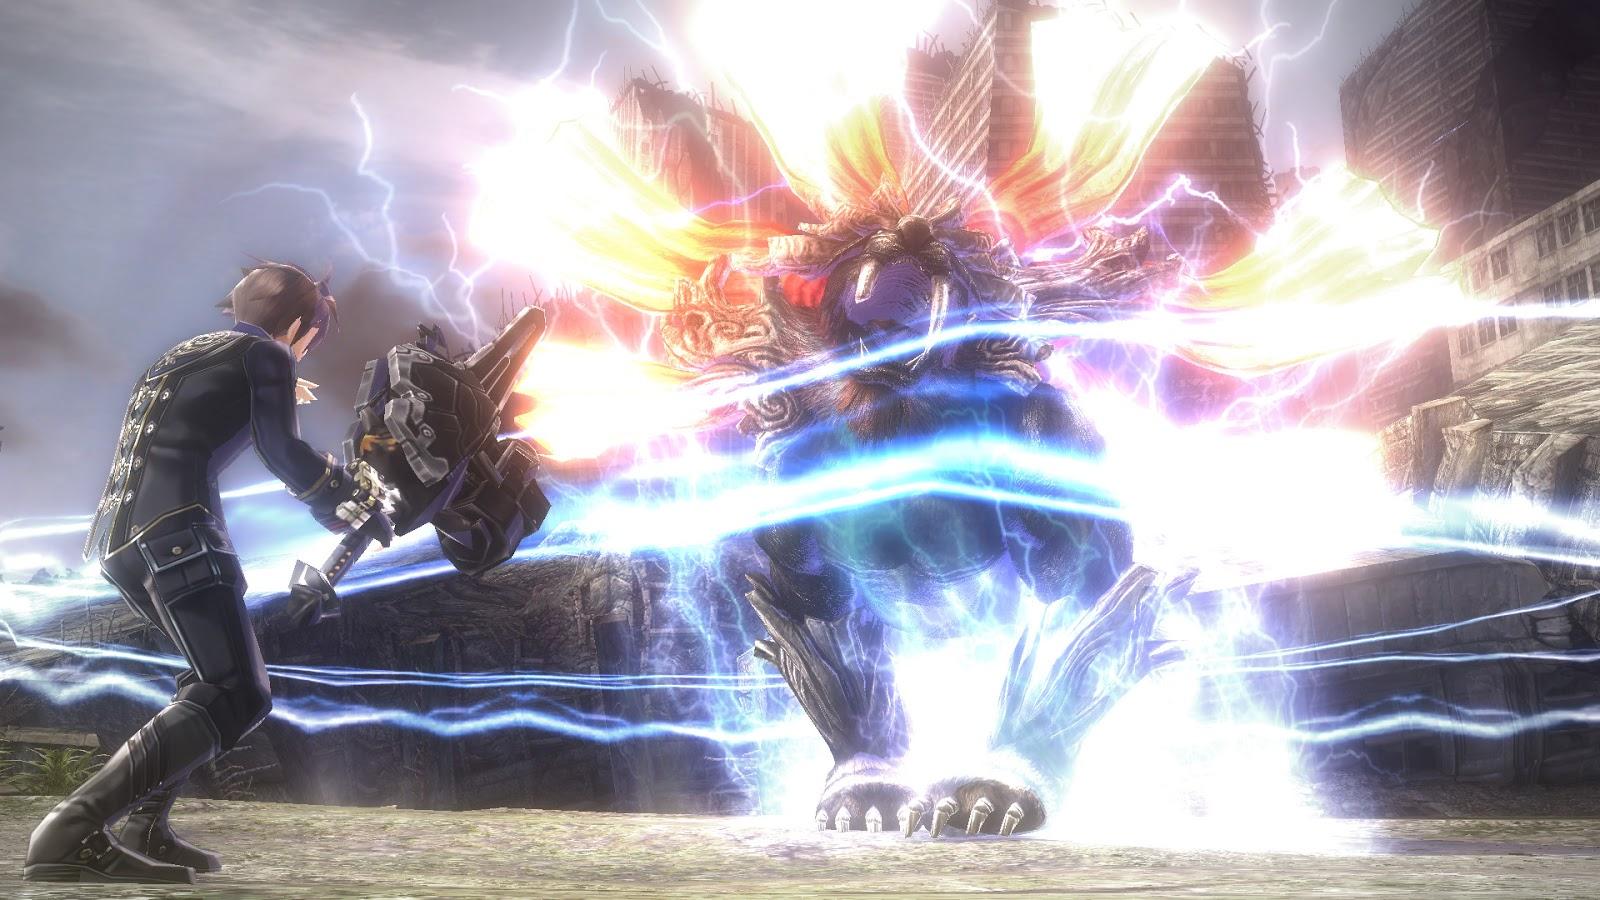 GOD EATER 2 Rage Burst ESPAÑOL PC Descargar Full (CPY) + REPACK 2 DVD5 (JPW) 4